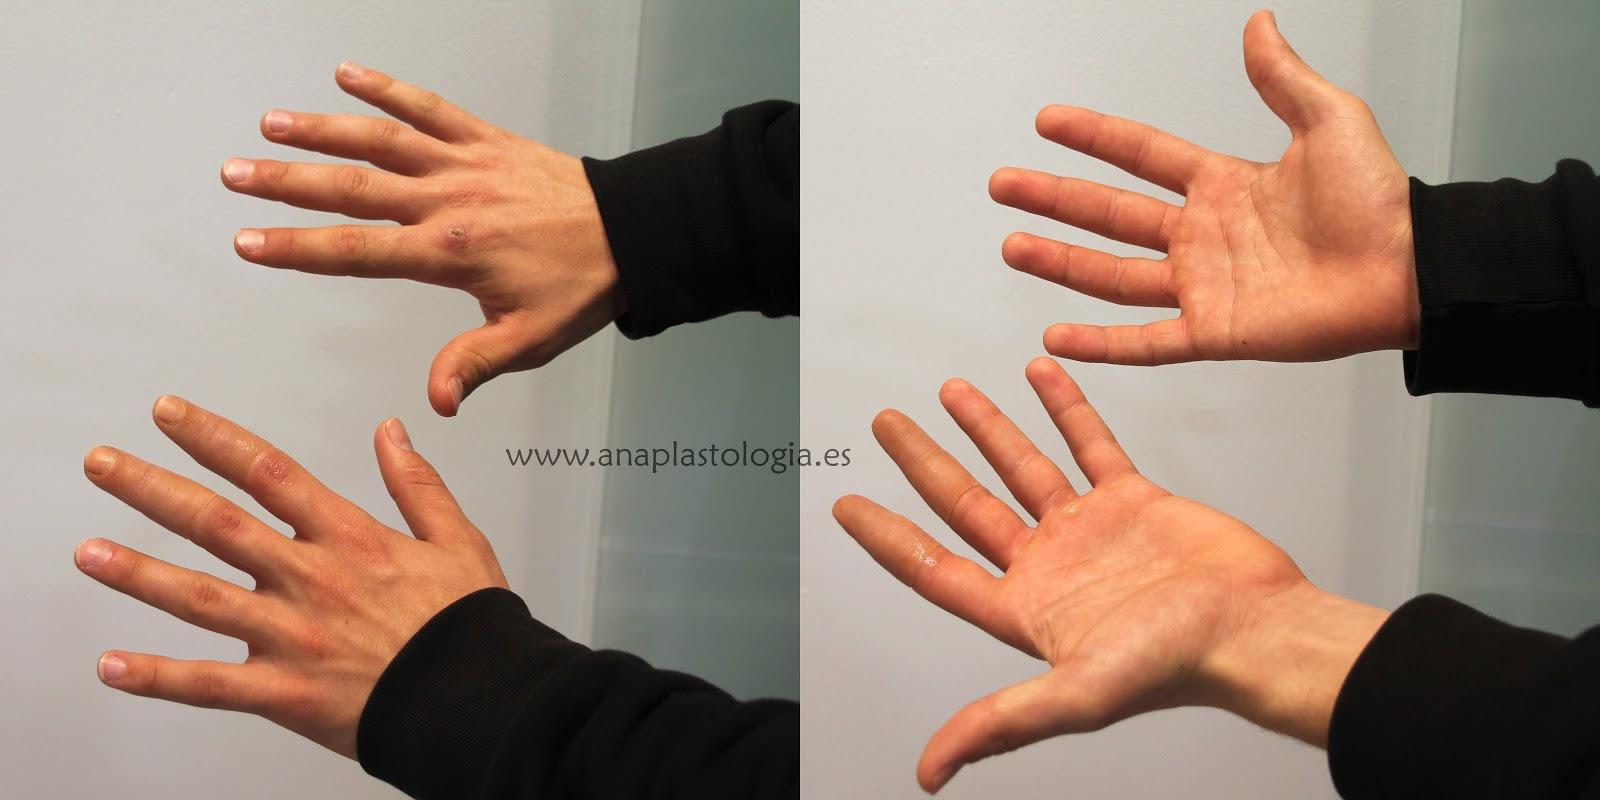 Anaplastologia: Prótesis de dedo